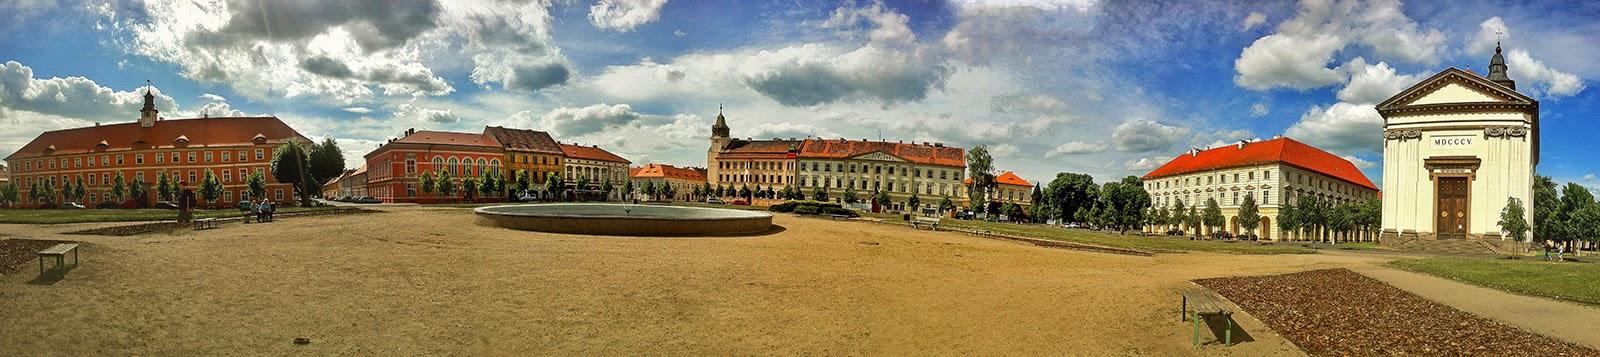 Terezin, Czech Republic